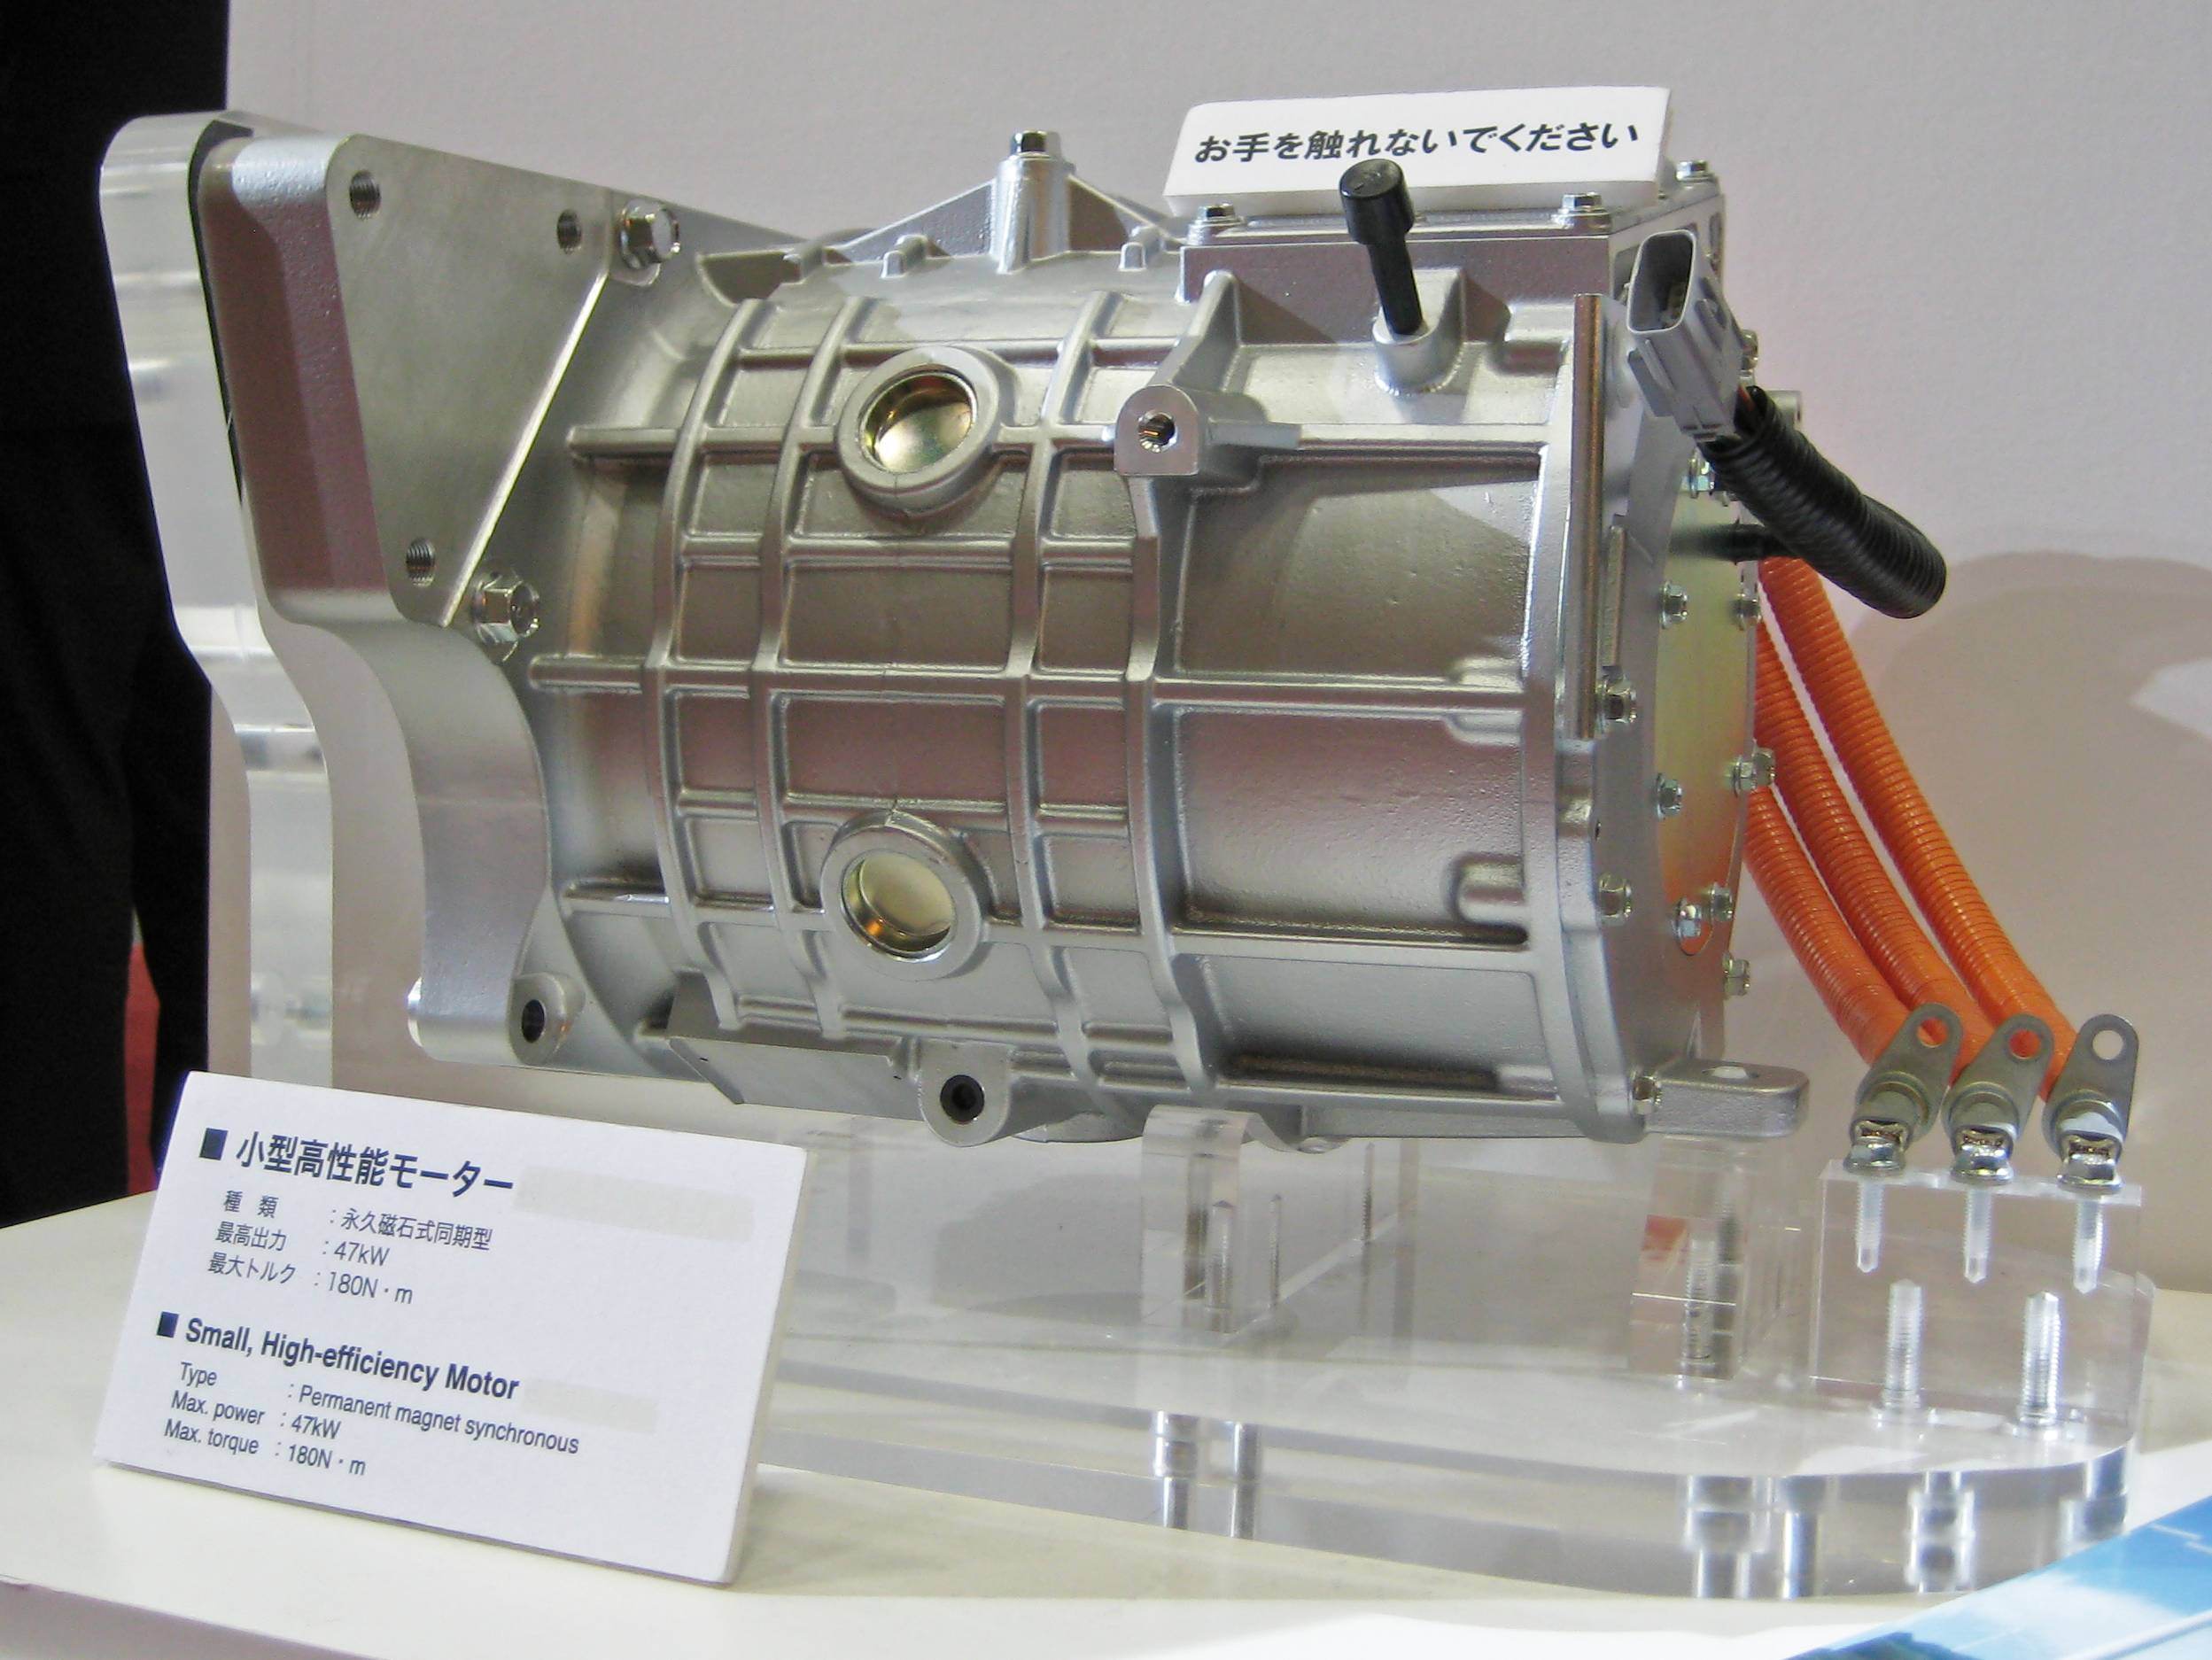 Mitsubishi i MiEV – electric highway